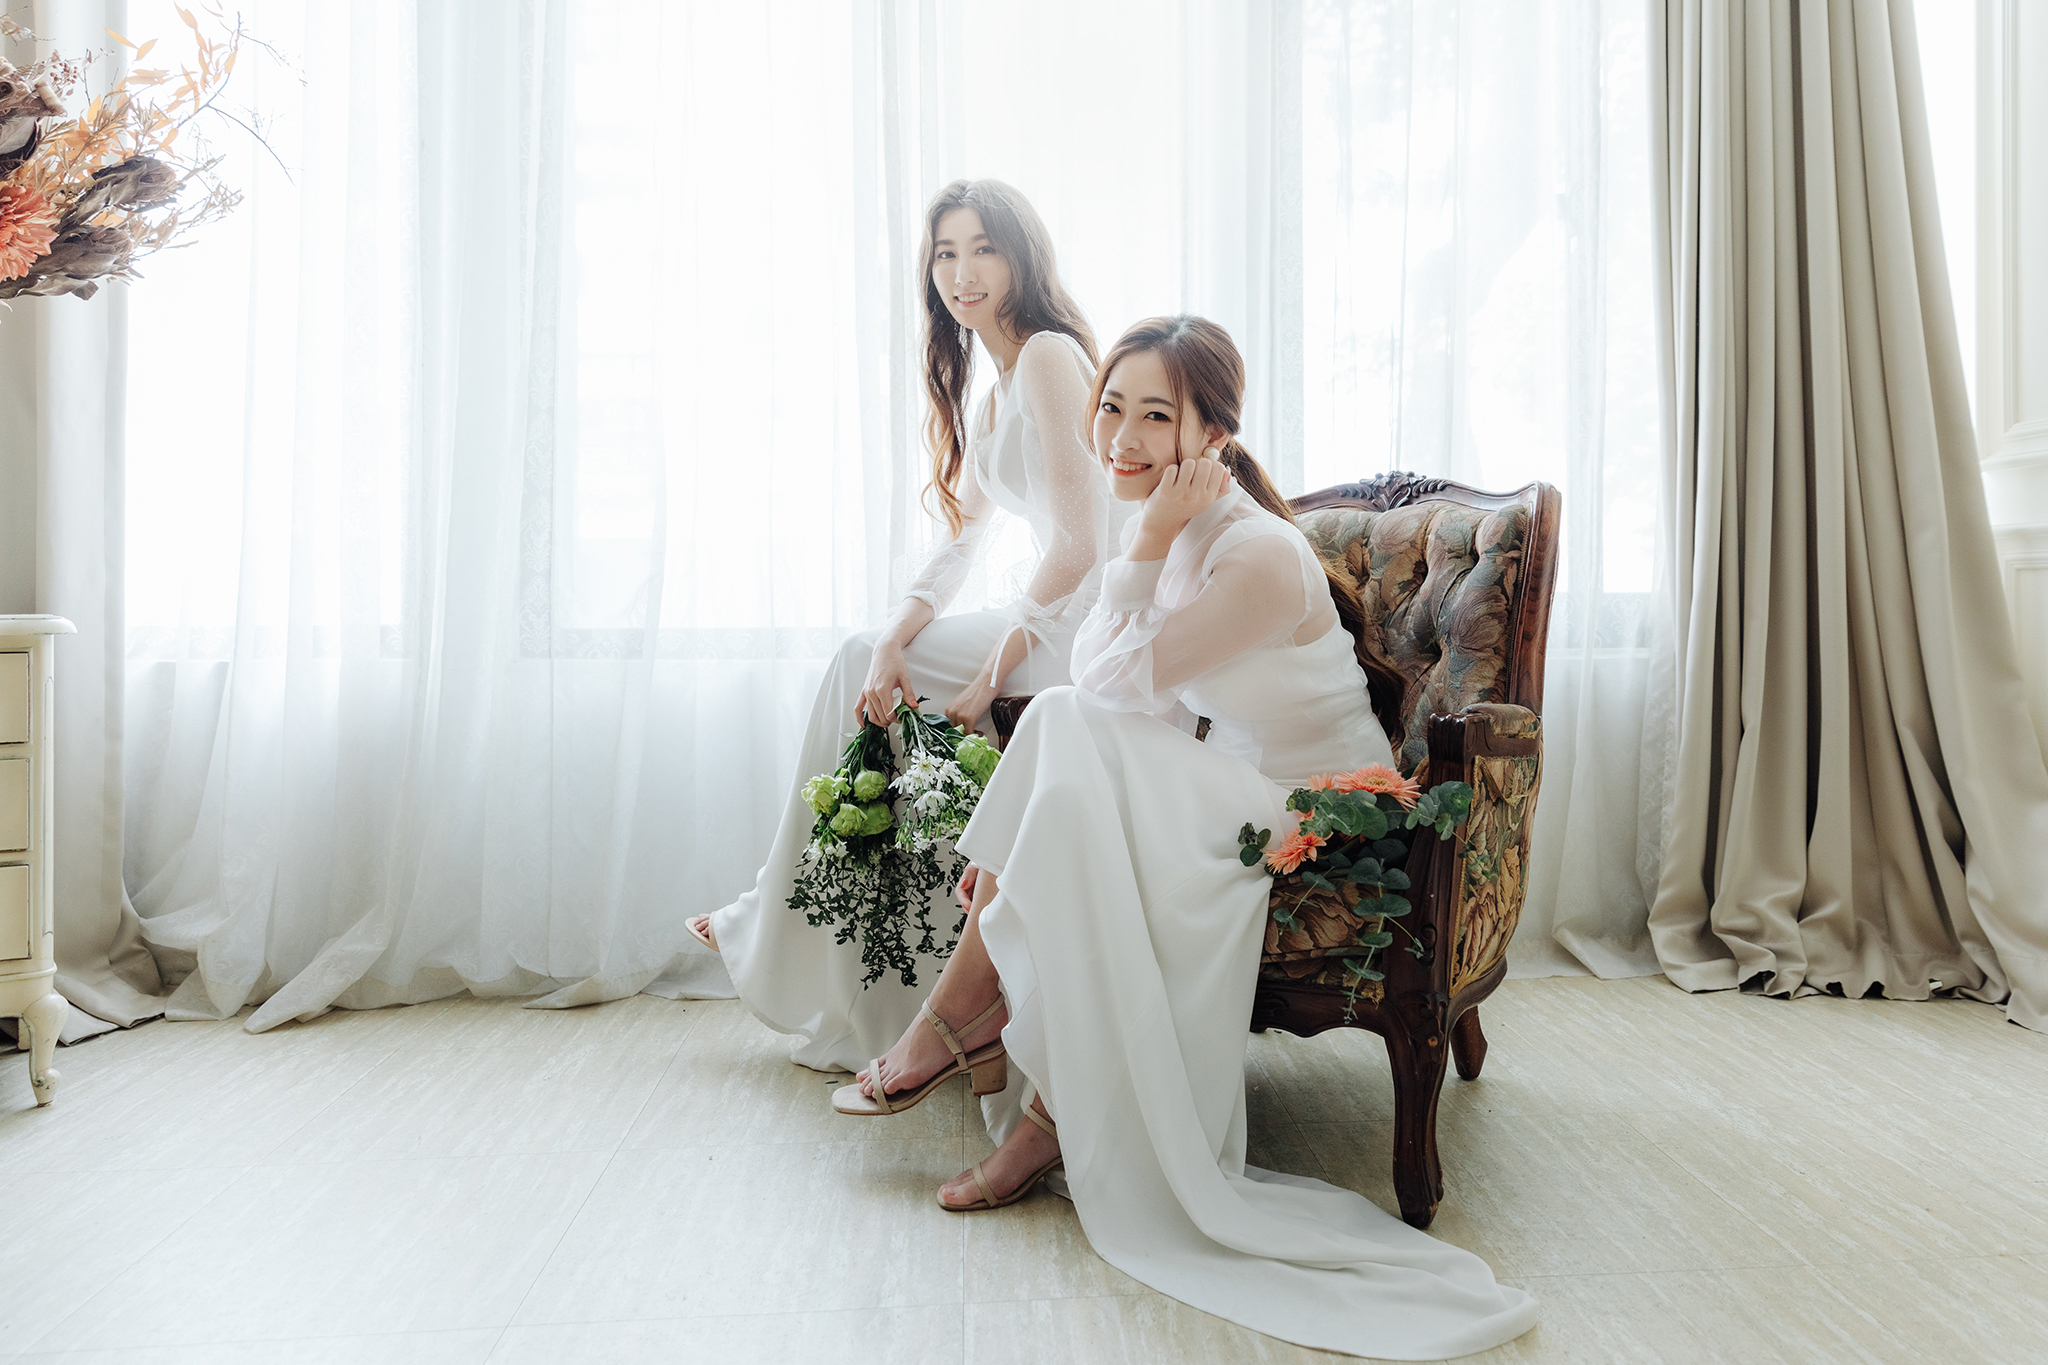 49929258351 df0a217d2f o - 【閨蜜婚紗】+Jessy & Tiffany+